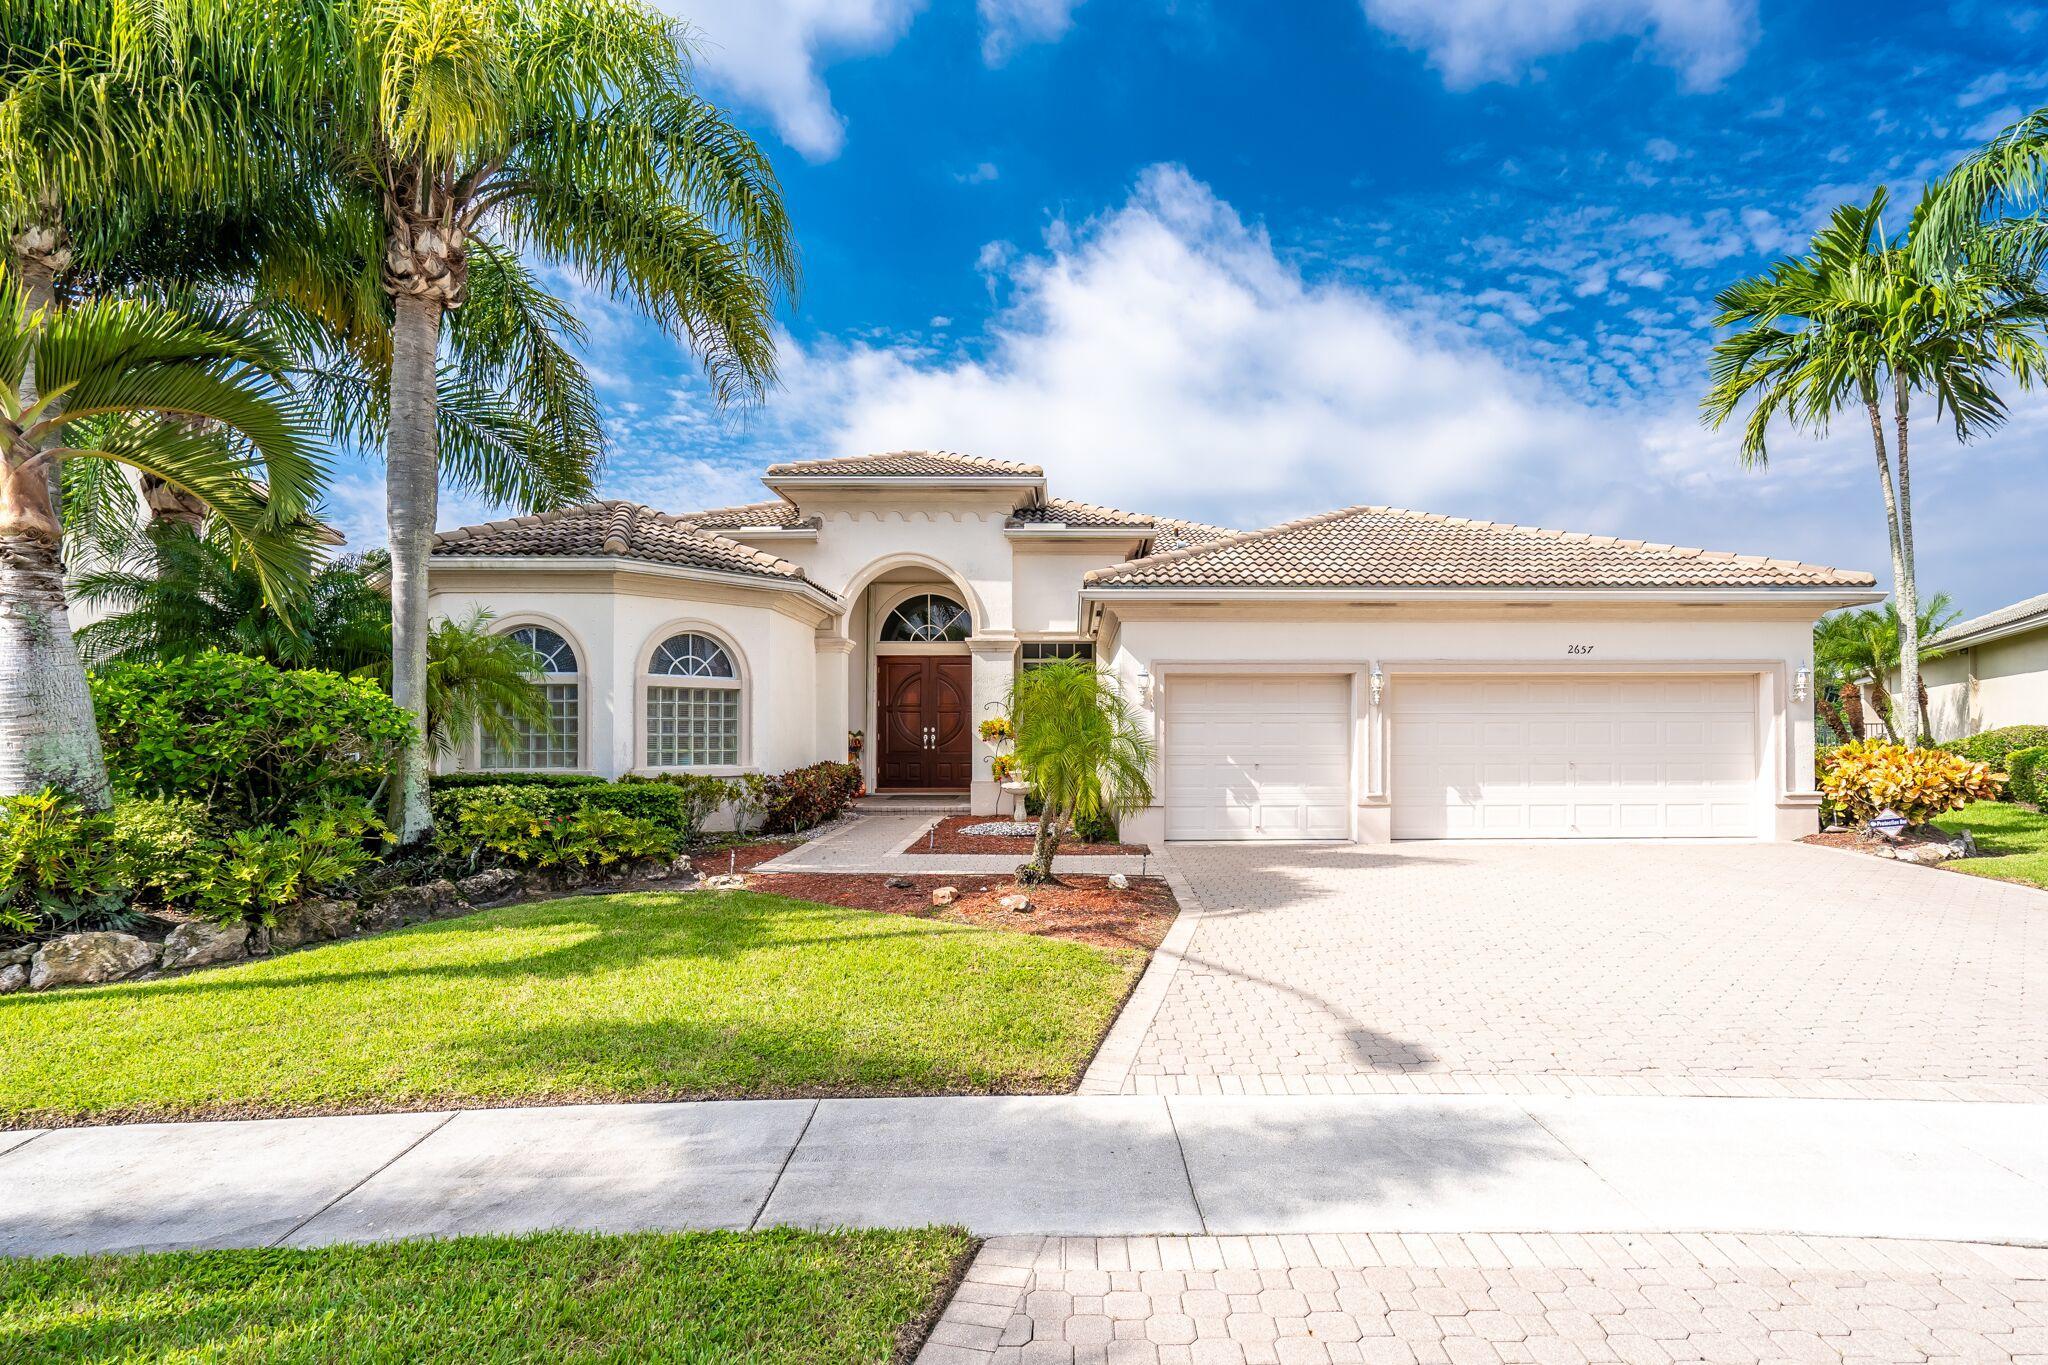 2657 Windwood Way, Royal Palm Beach, Florida